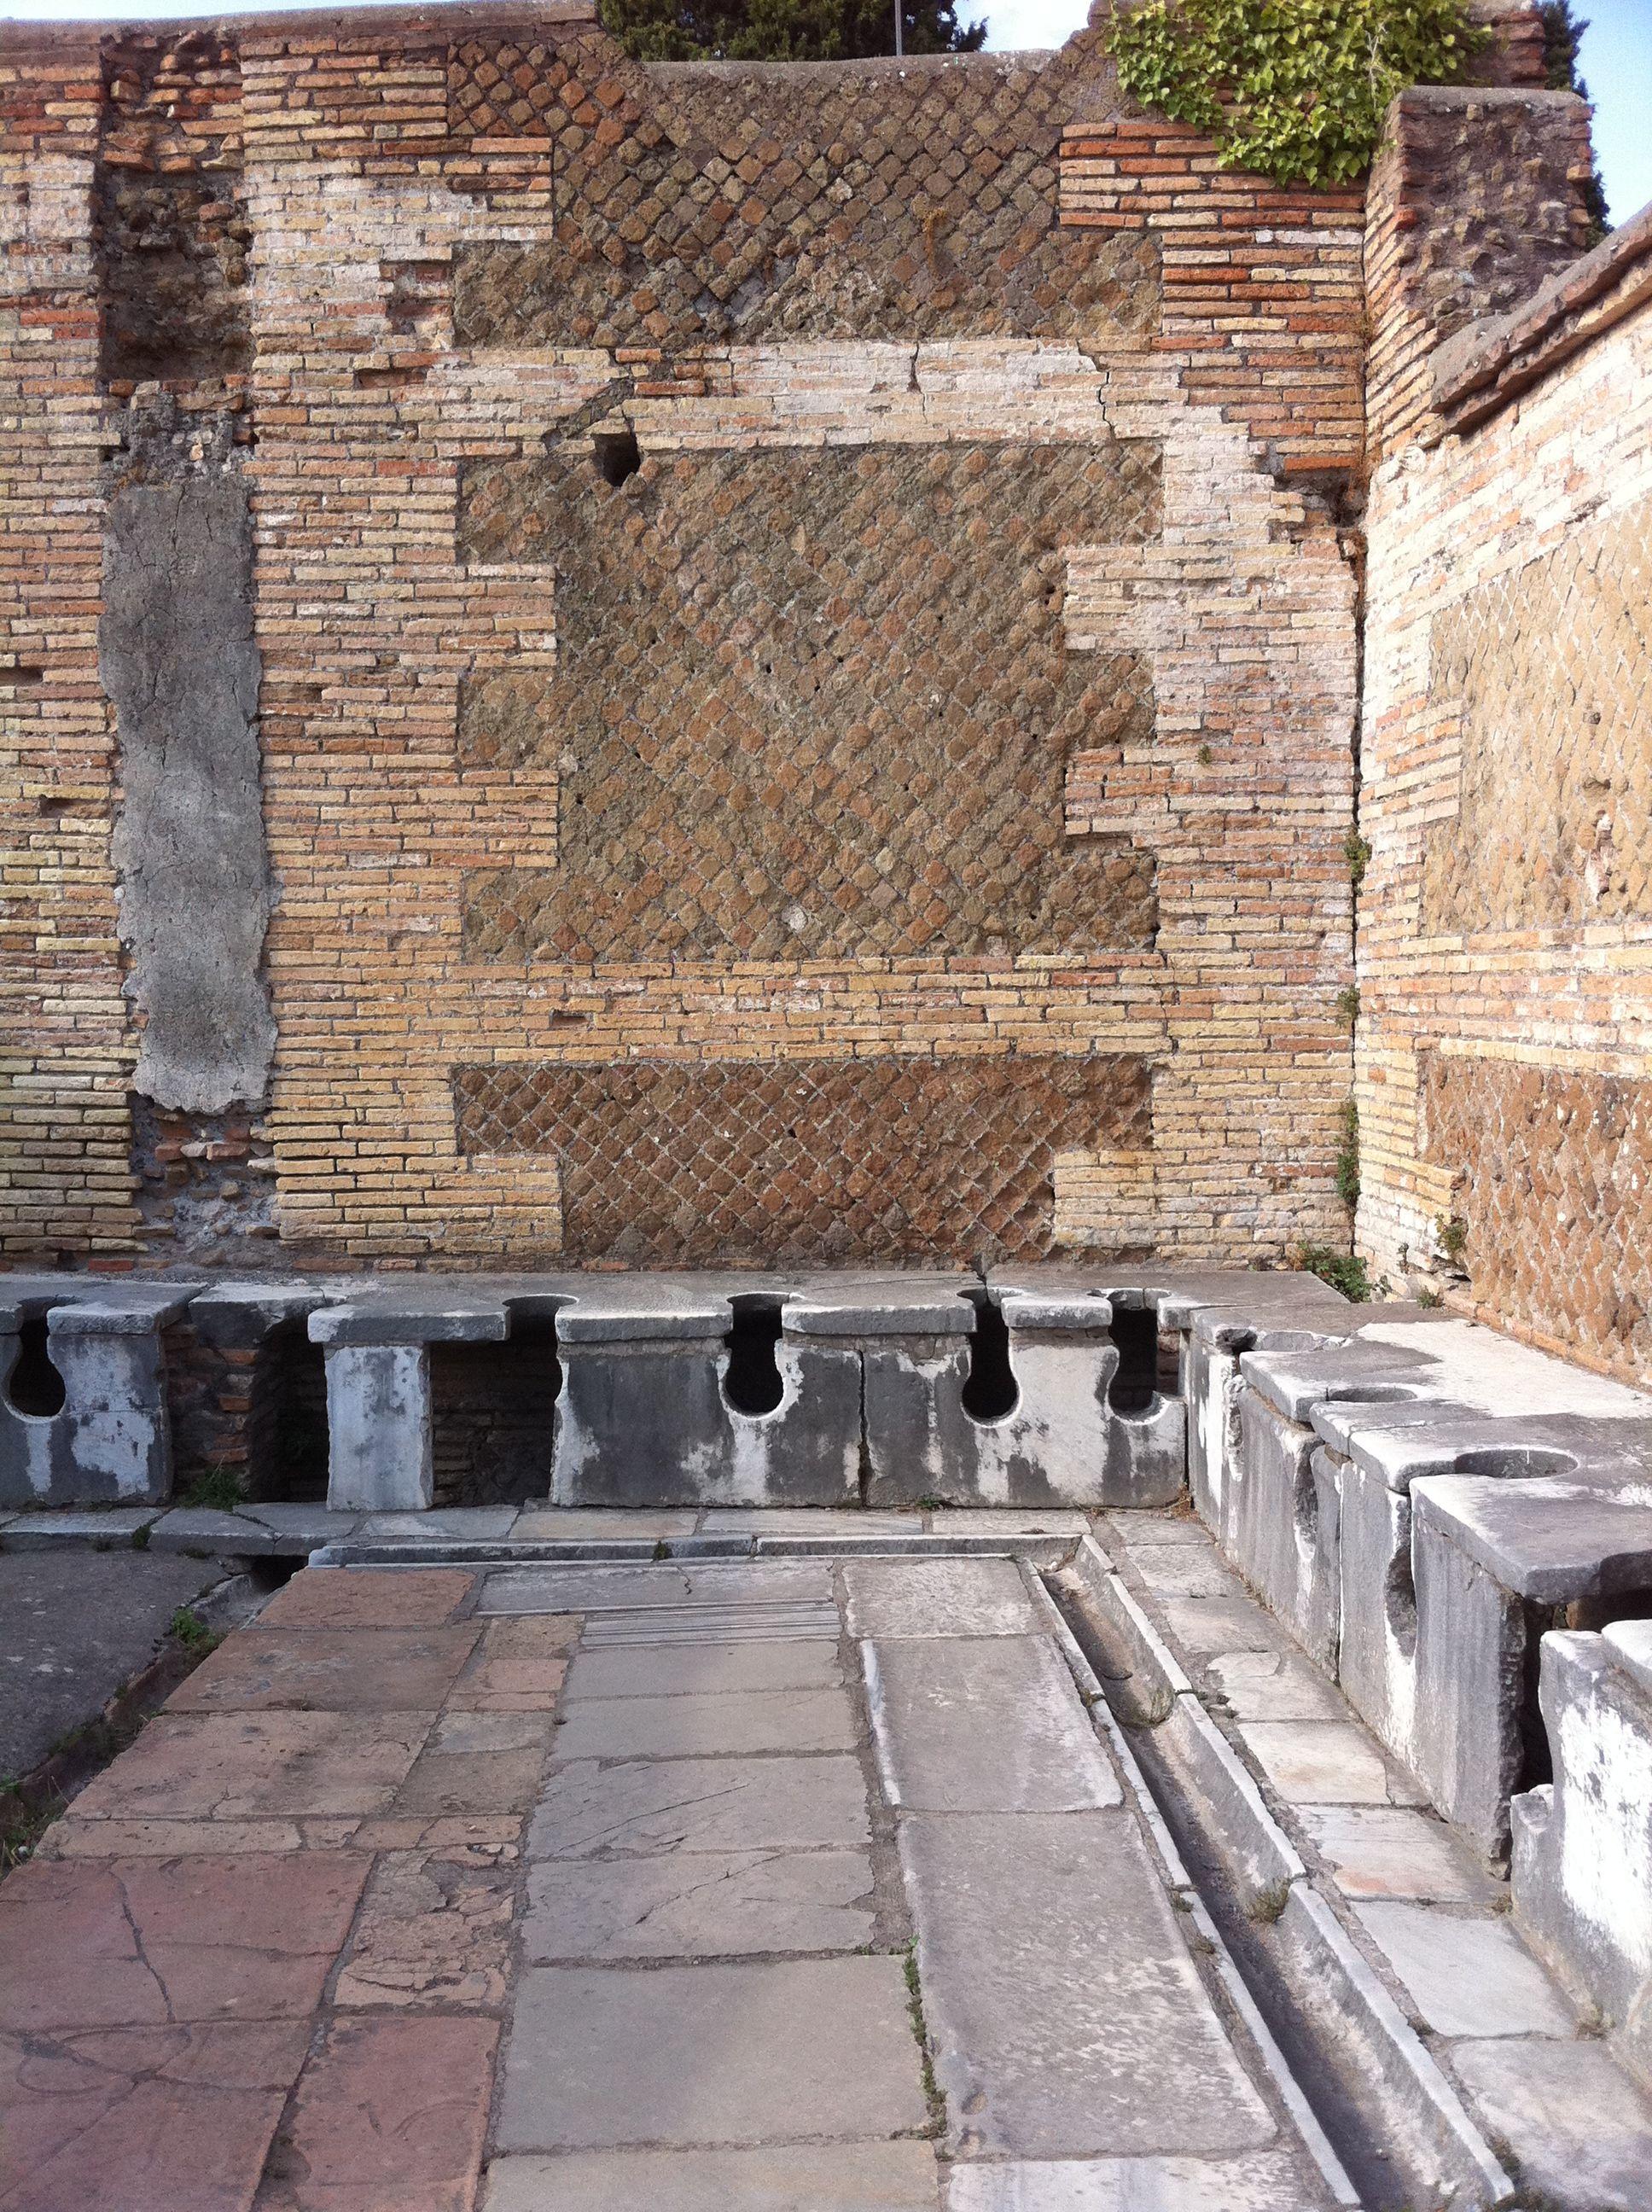 Public toilets in Rome!!